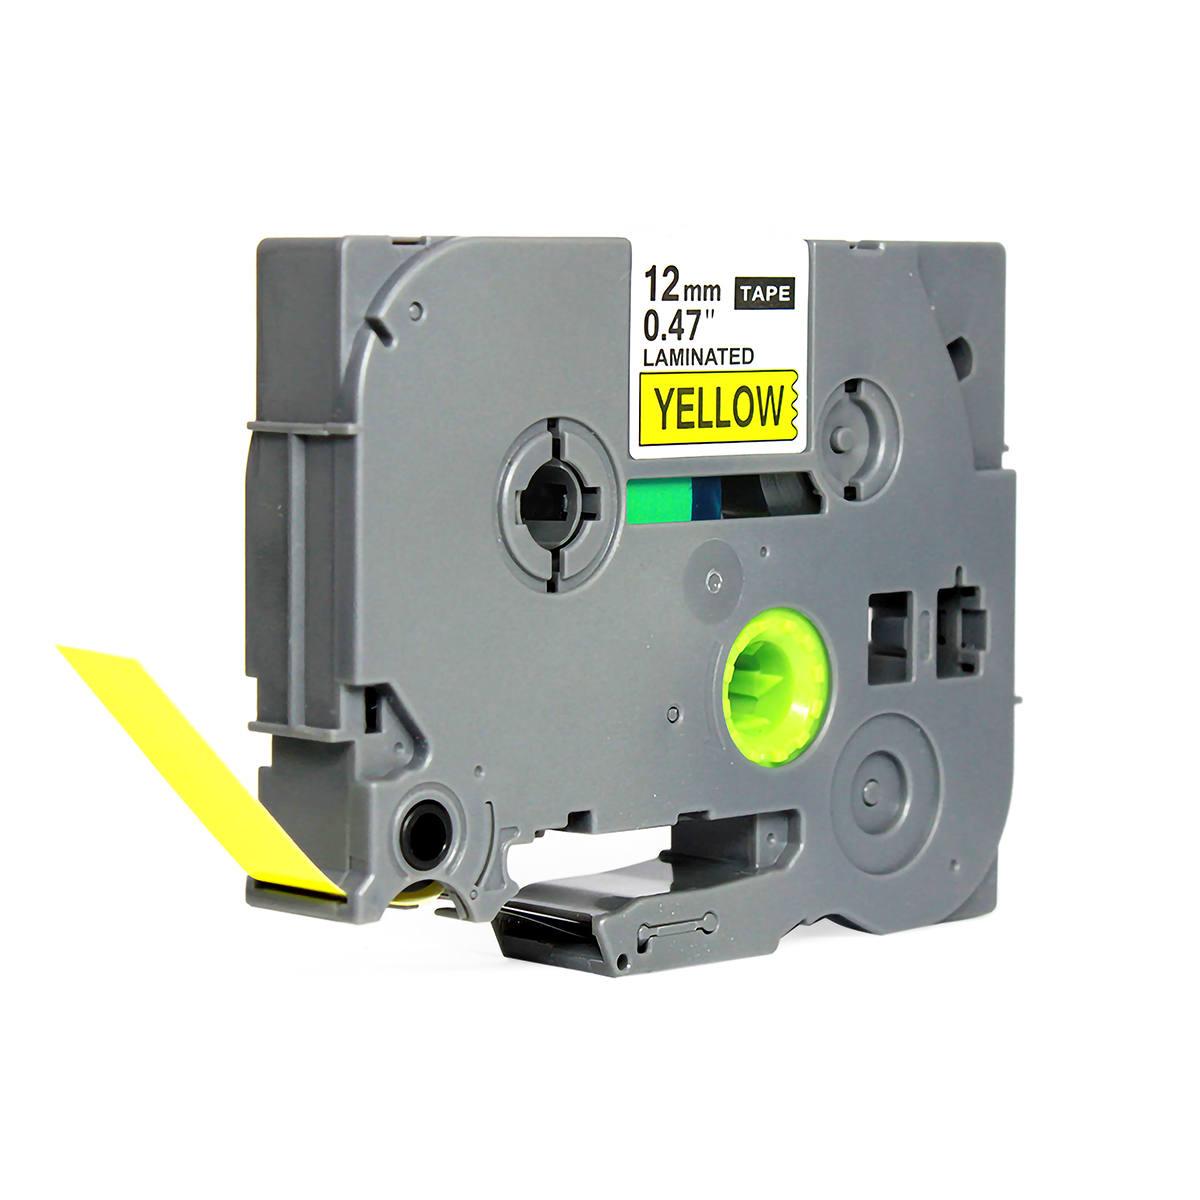 Fita Compatível para Rotulador 12mm x 8m Amarelo/Preto Marca X-Full Referência TZc-631 TZe-631 TZ-631 para Brother